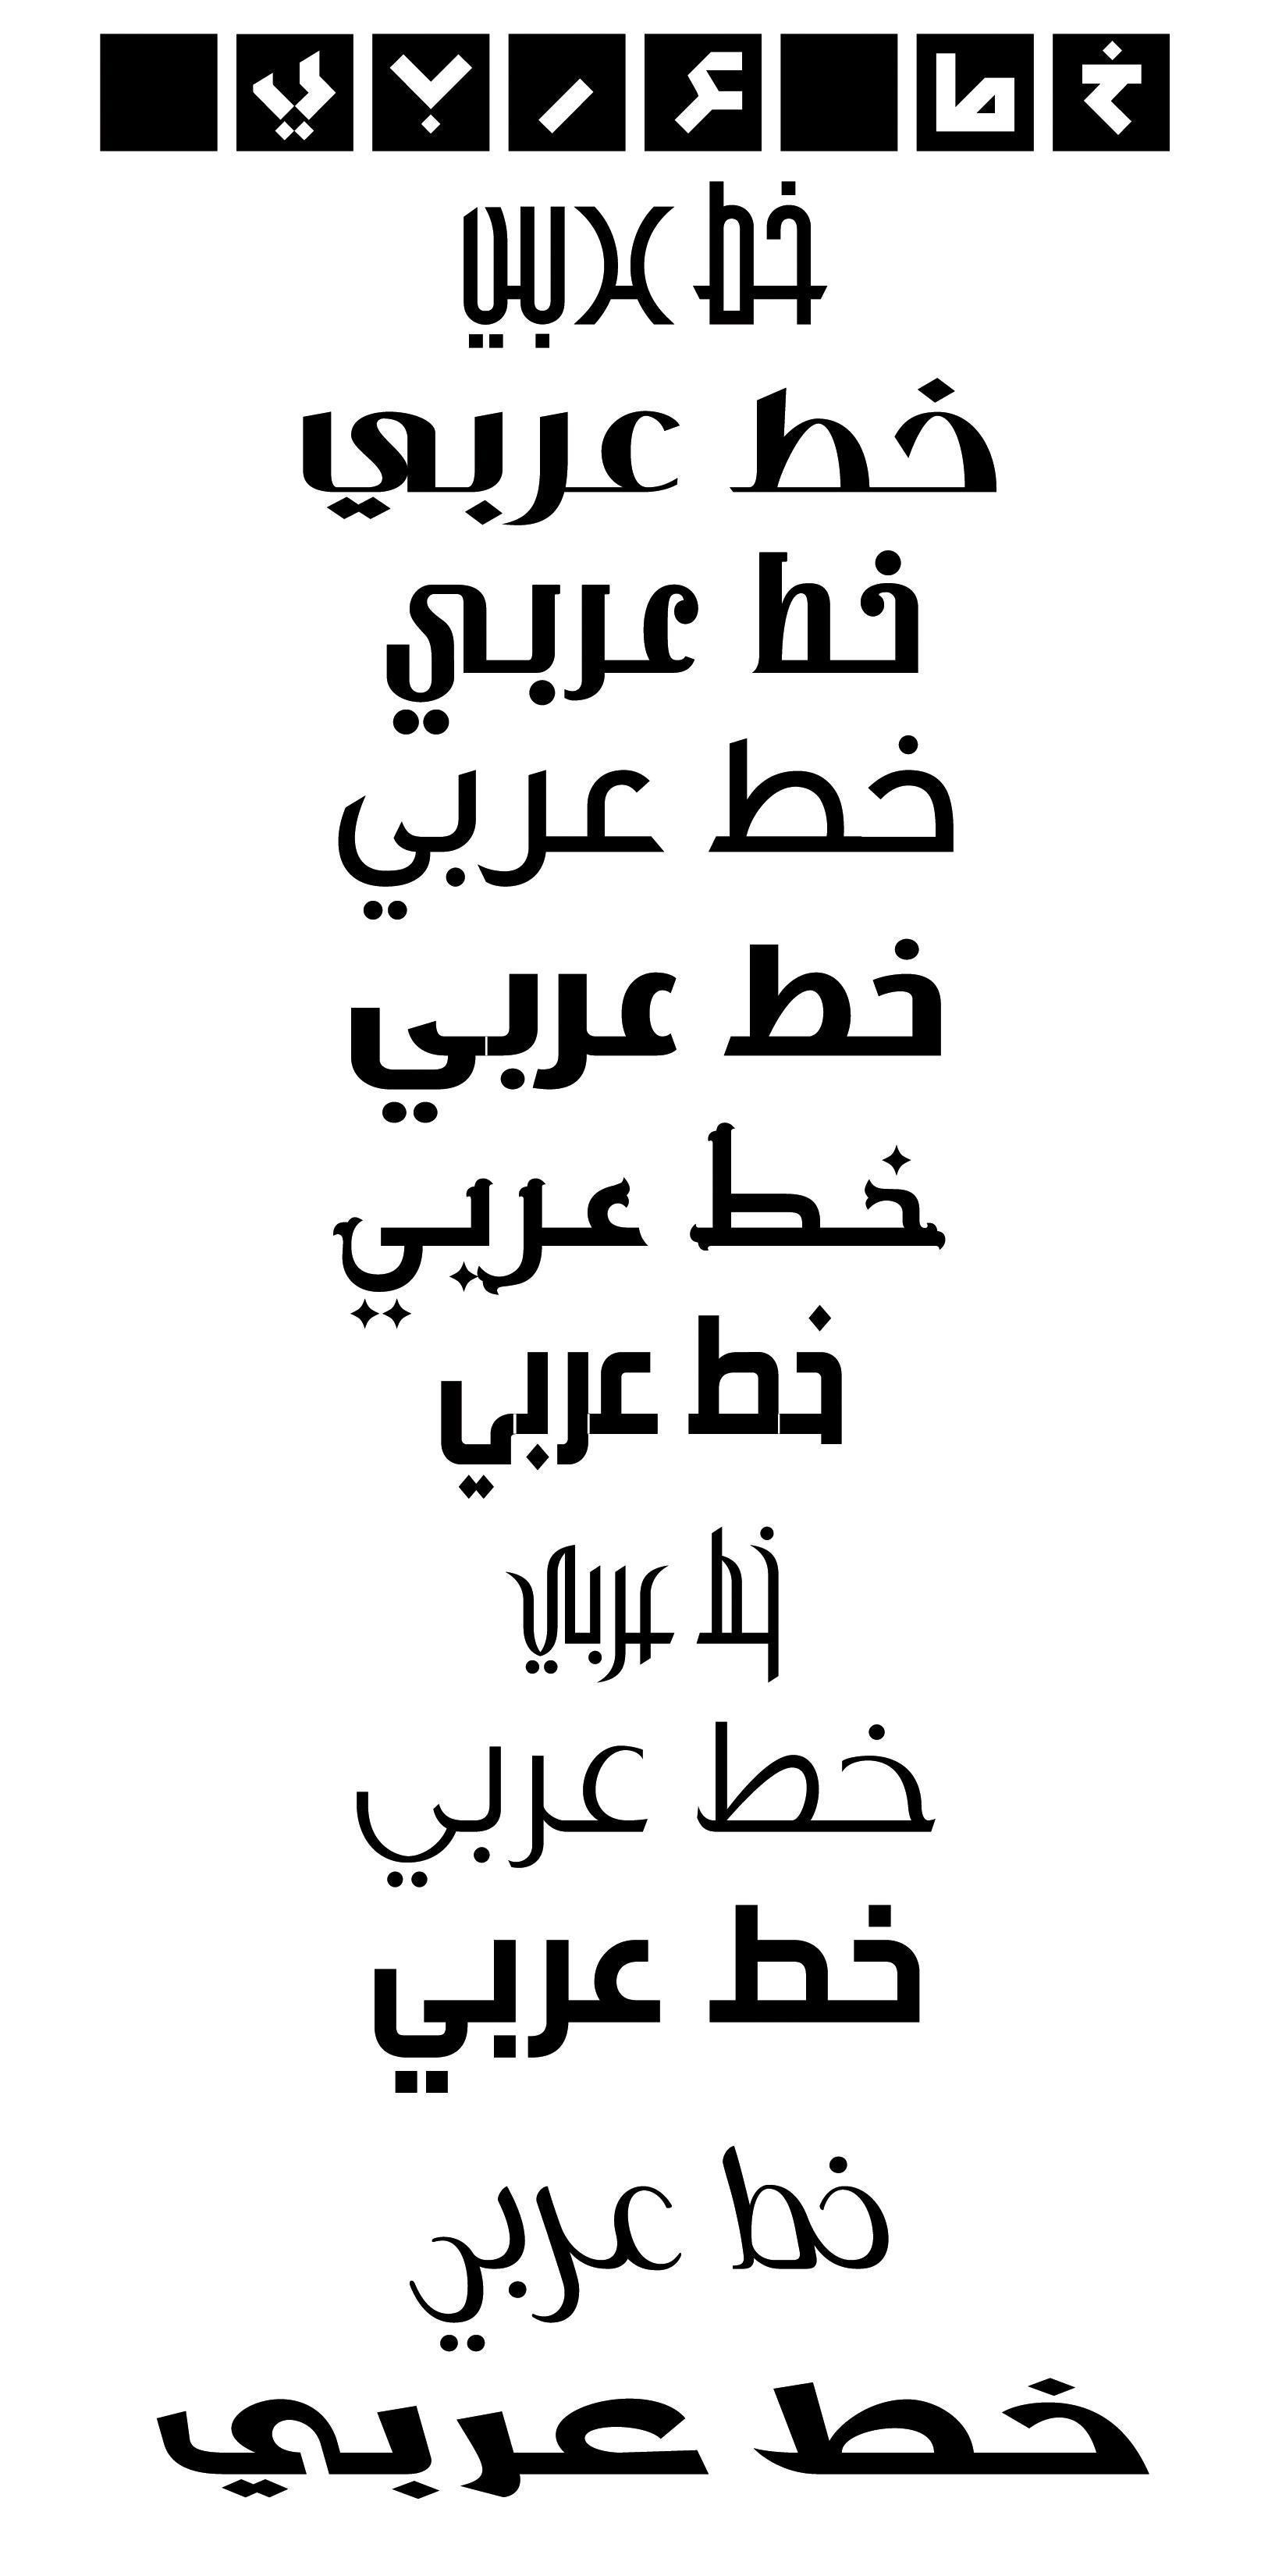 arabic font 4 mac or pc by naderbellal on DeviantArt